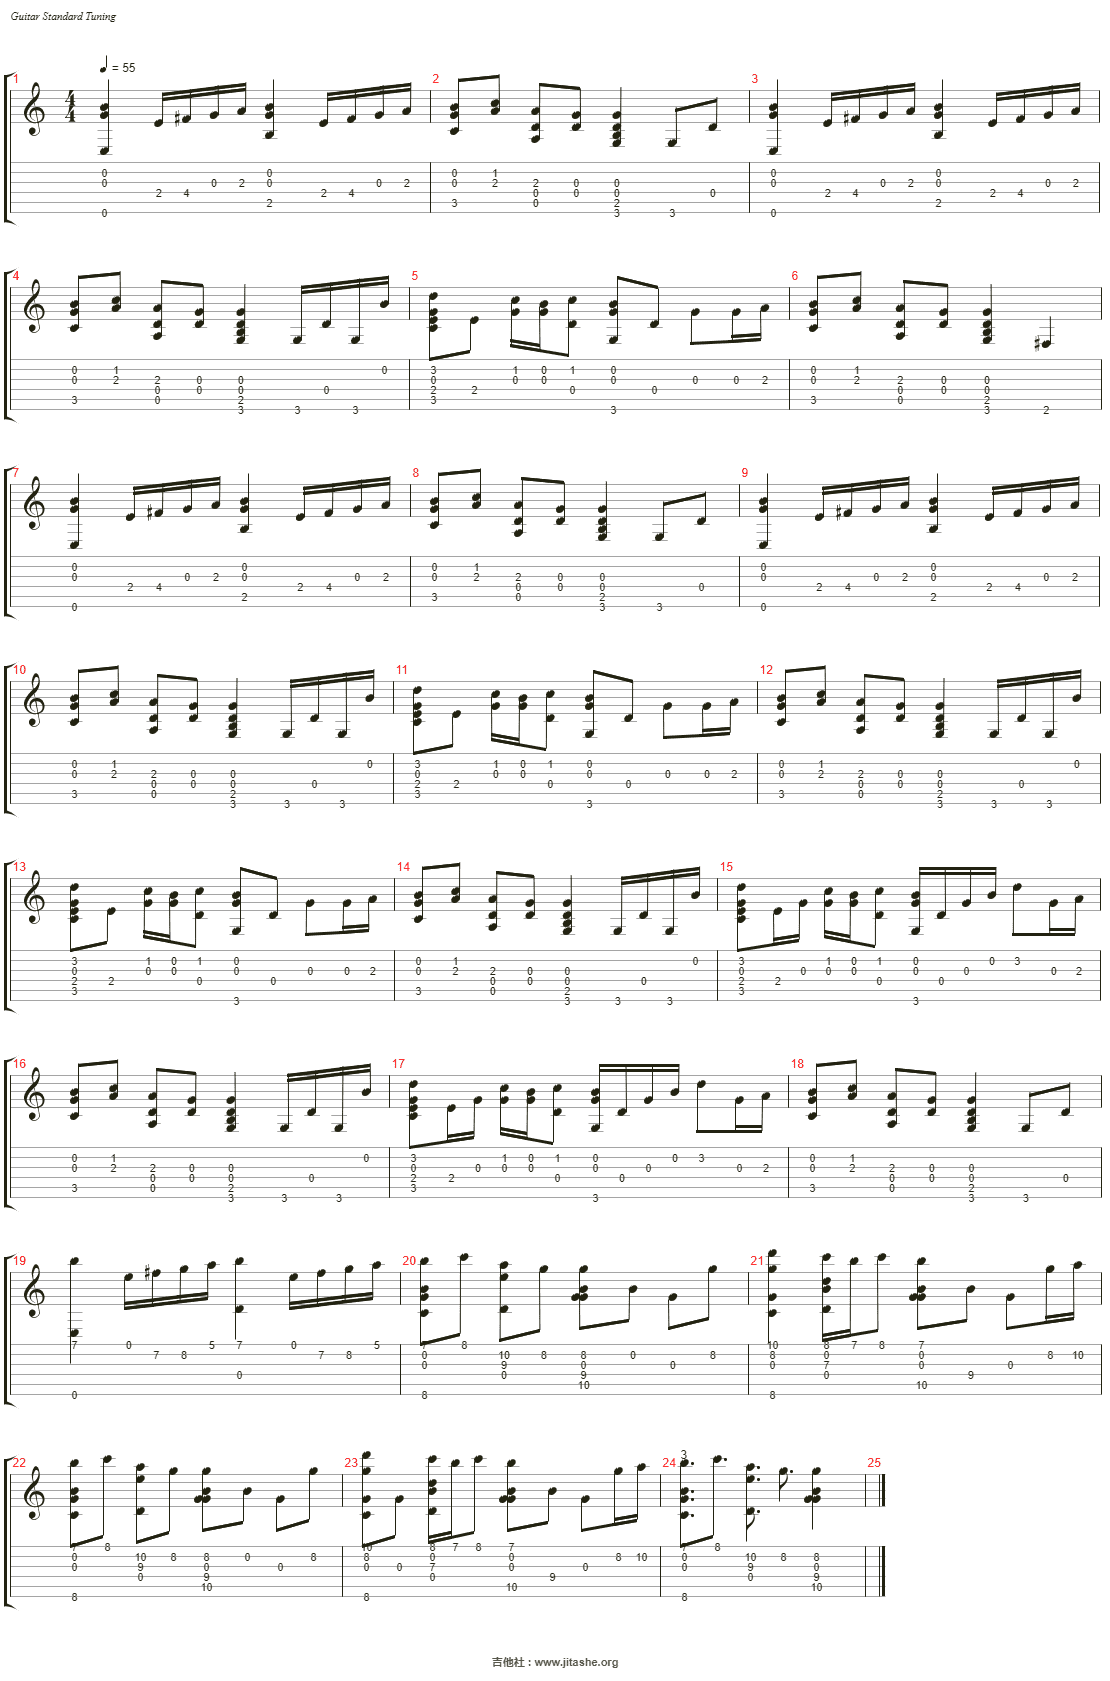 Lost in love吉他谱(Jazz Guitar)_群星